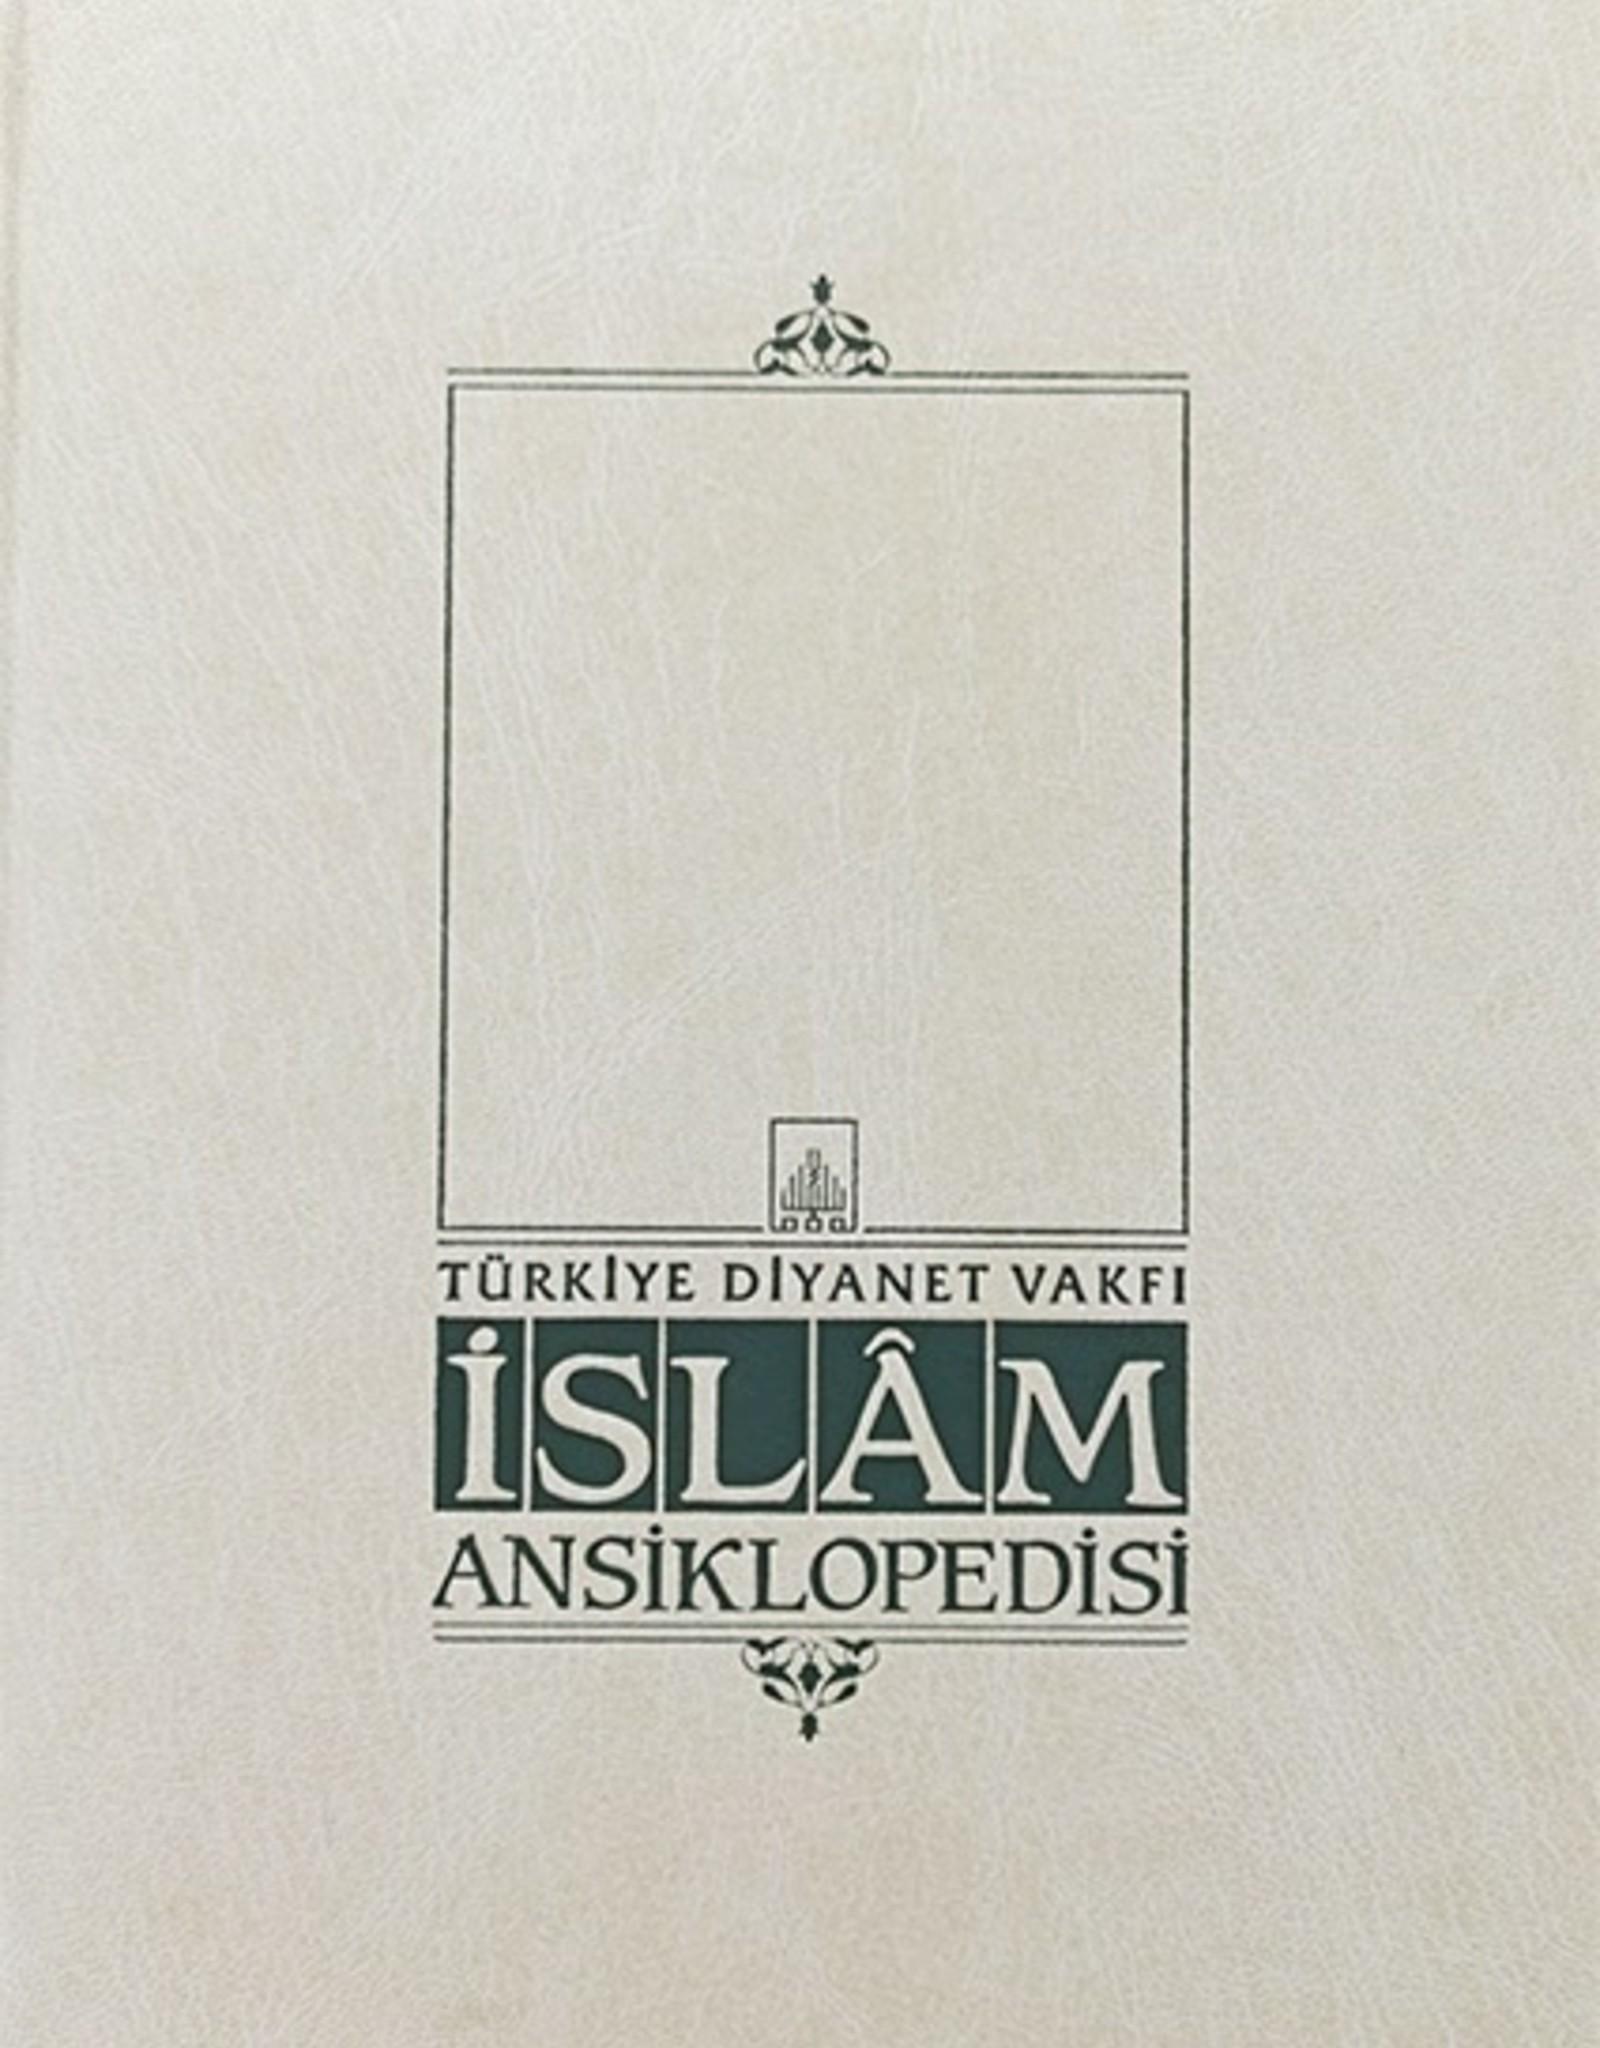 İslam Ansiklopedisi 29. Cilt